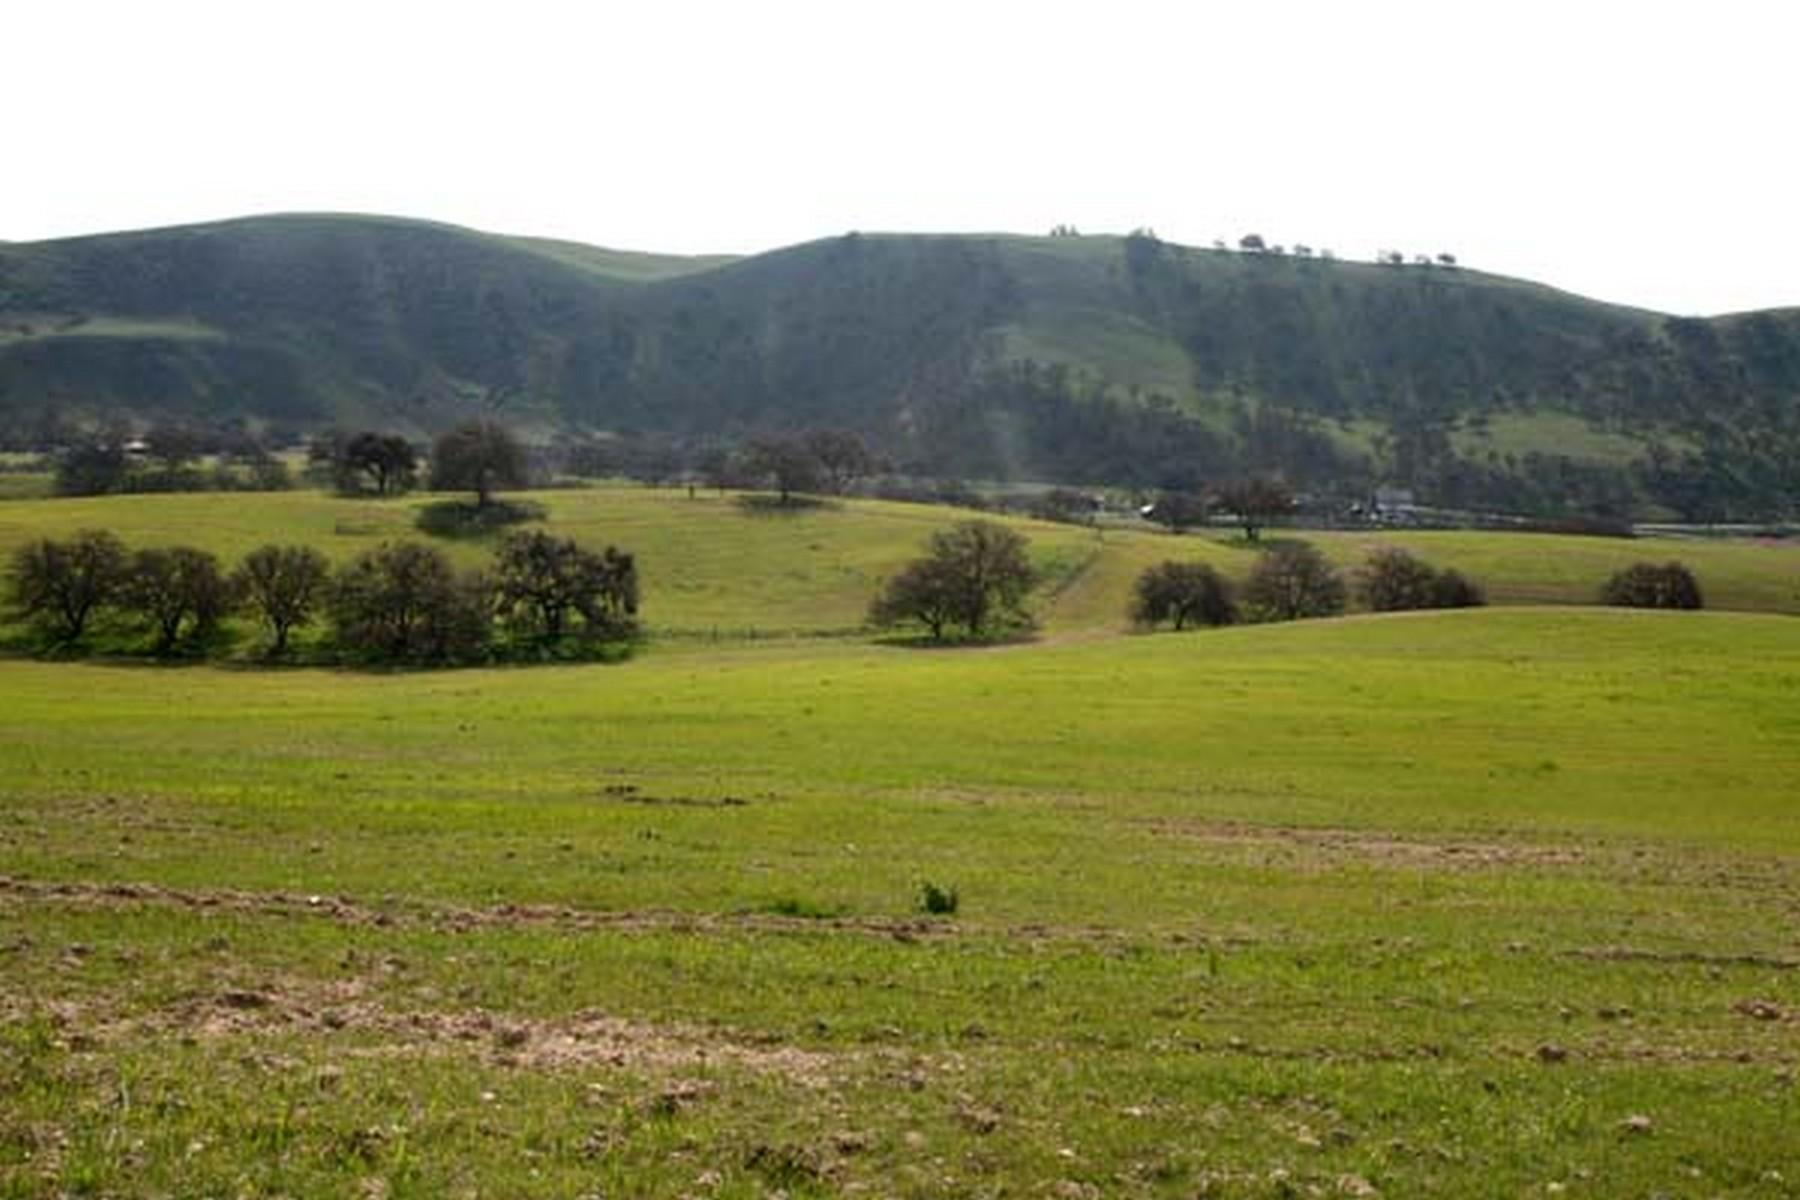 Land for Sale at 80 Acres Nickel Creek 0 Nickel Creek Rd San Miguel, California, 93451 United States